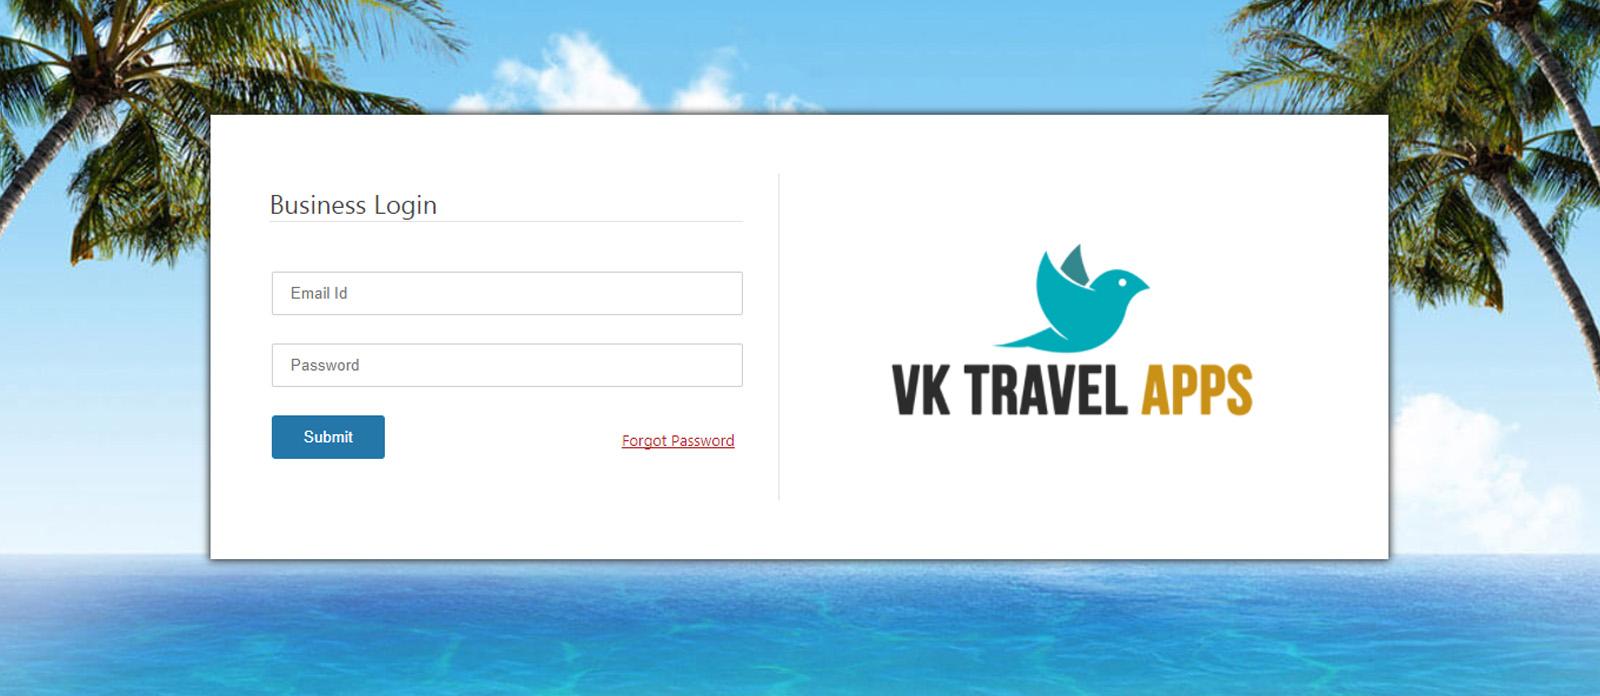 Can I cancel my VK TRAVEL APP Subscription? : VK TRAVEL APP